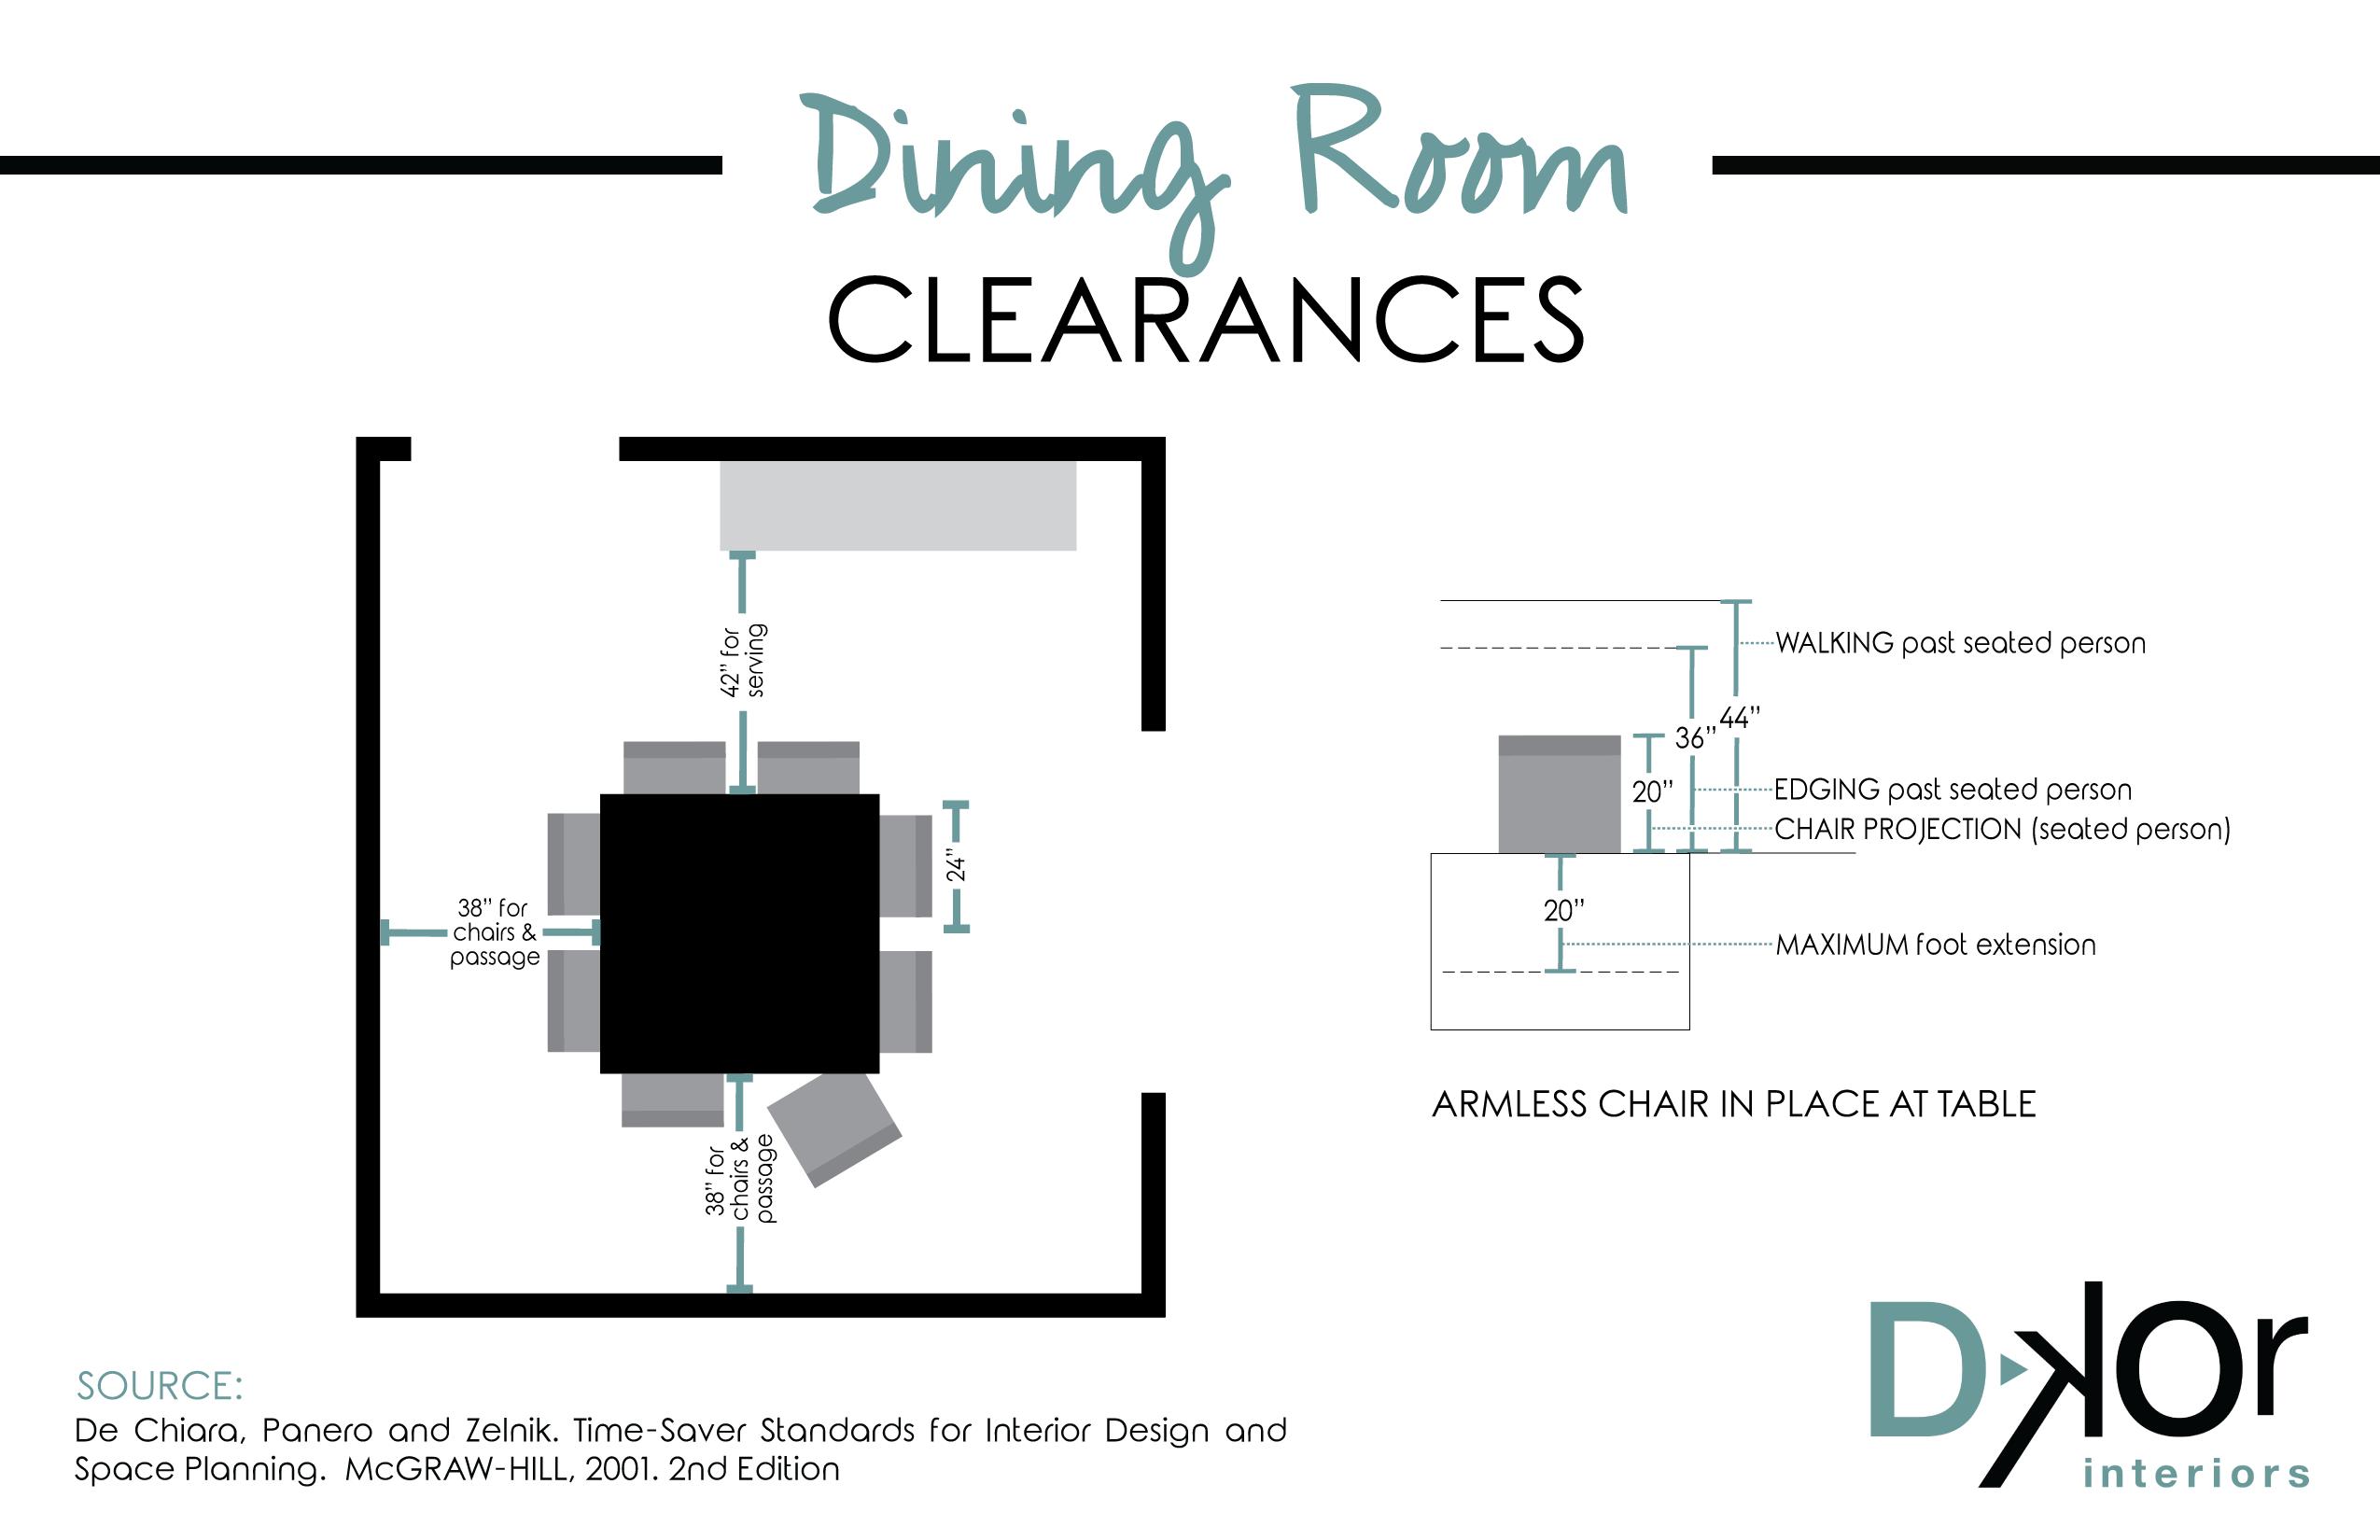 Dining room Clearances -  Residential Interior Design #clearances #diningroom #idealmeasurements #interiordesign │ Miami Residential Interior Design Firm www.dkorinteriors.com